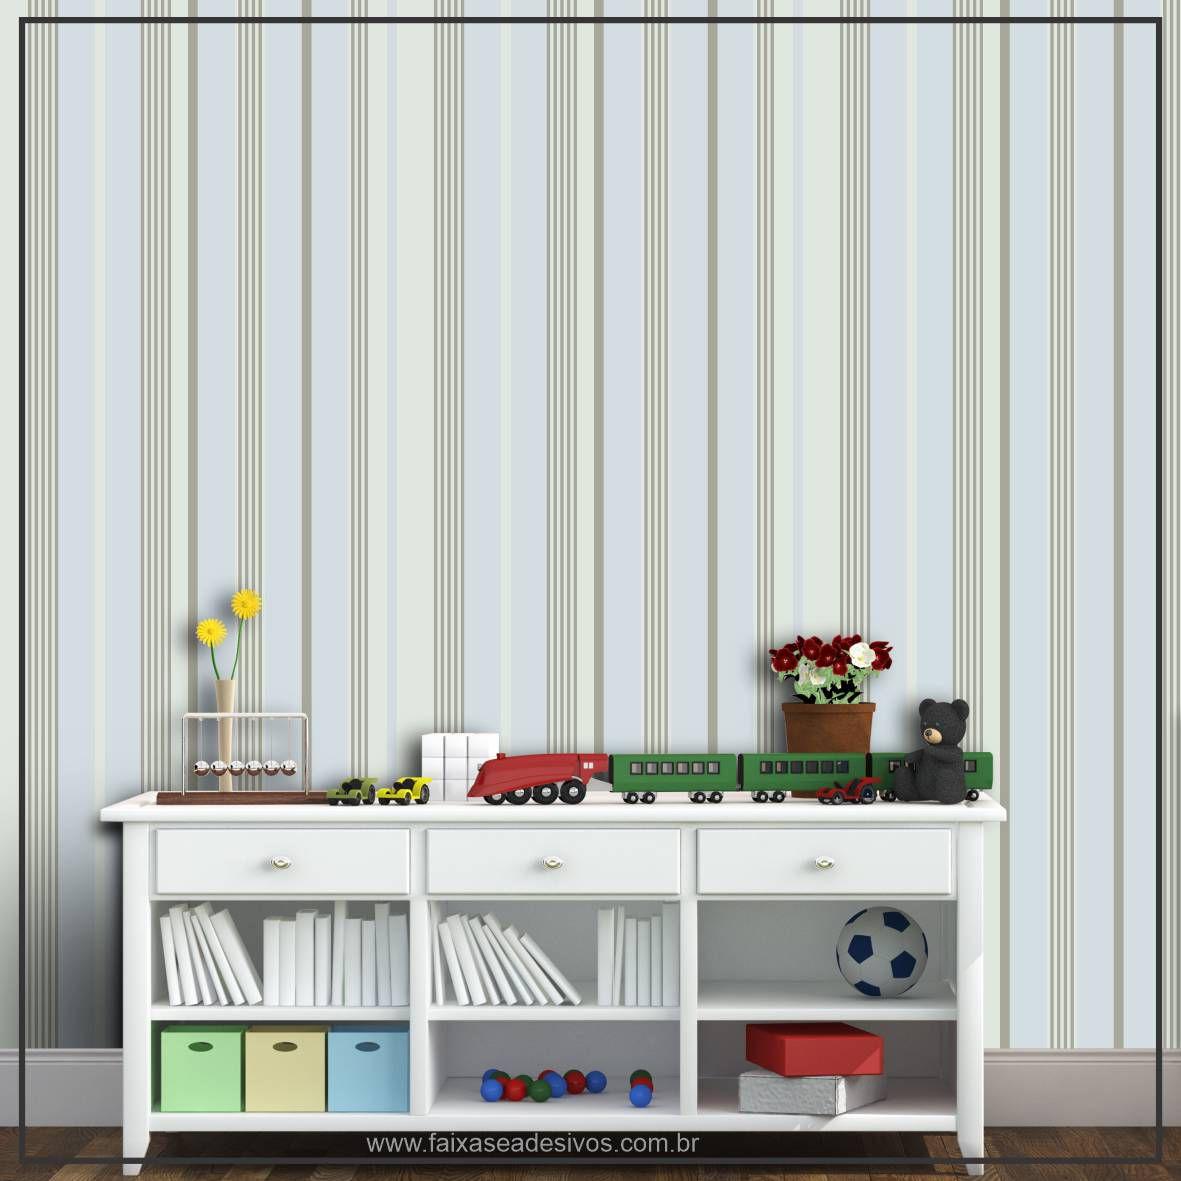 036 - Adesivo Decorativo de parede Listras esverdeado - 58cm larg  - Fac Signs